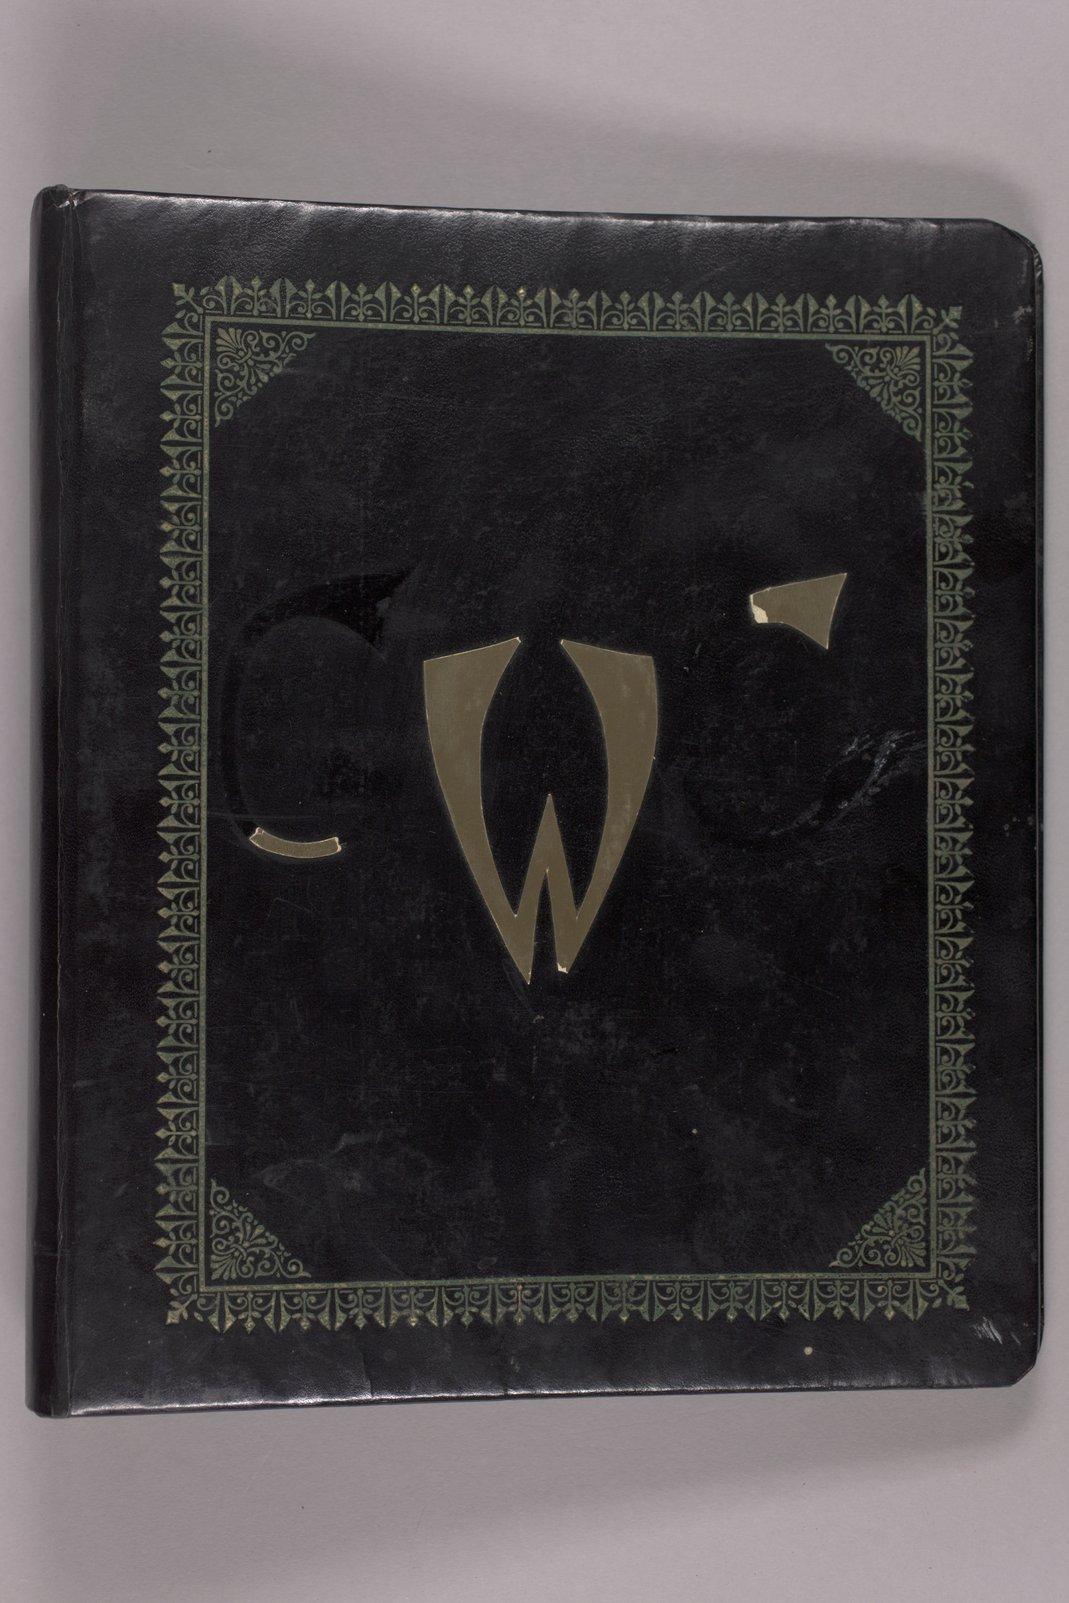 Goddard Woman's Club pressbook - Front cover